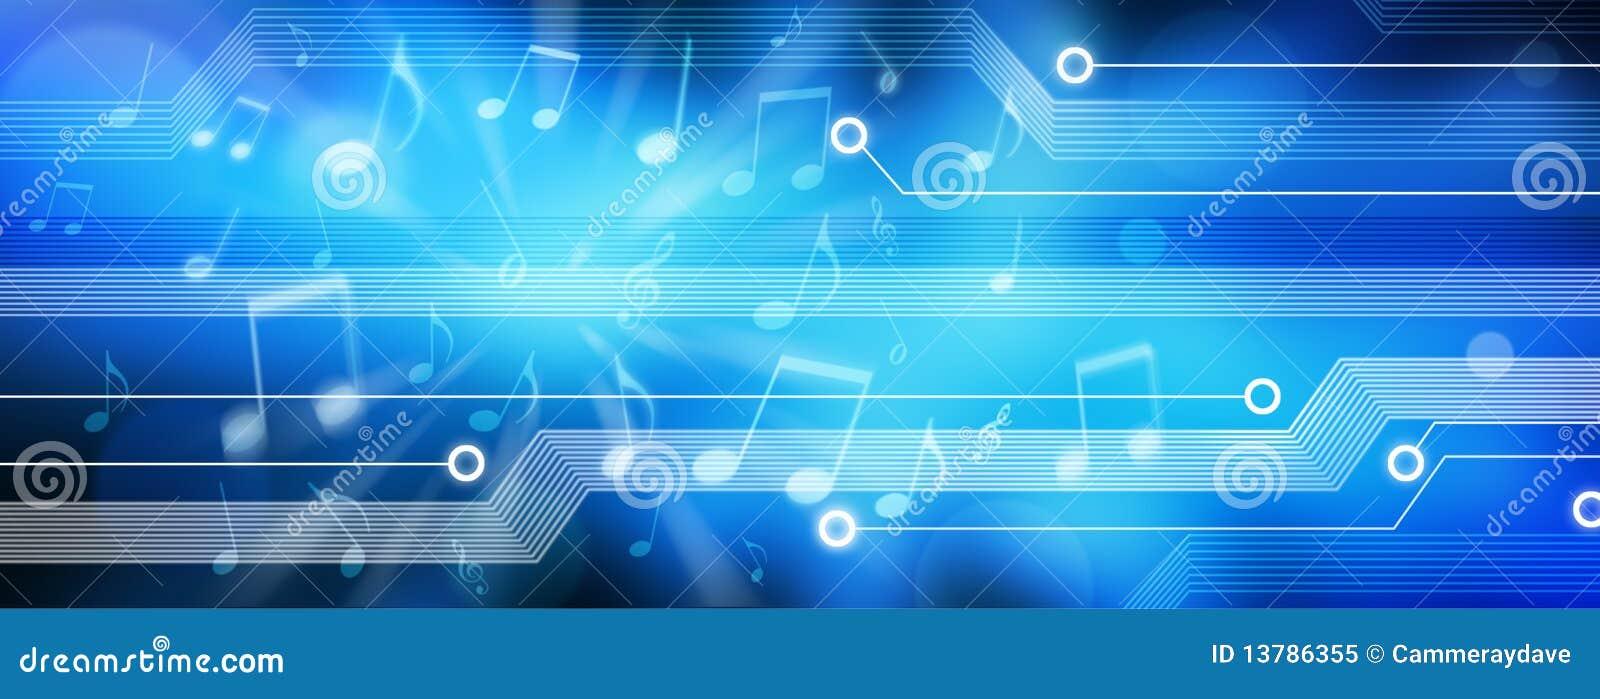 Musik-Hintergrund-Panorama